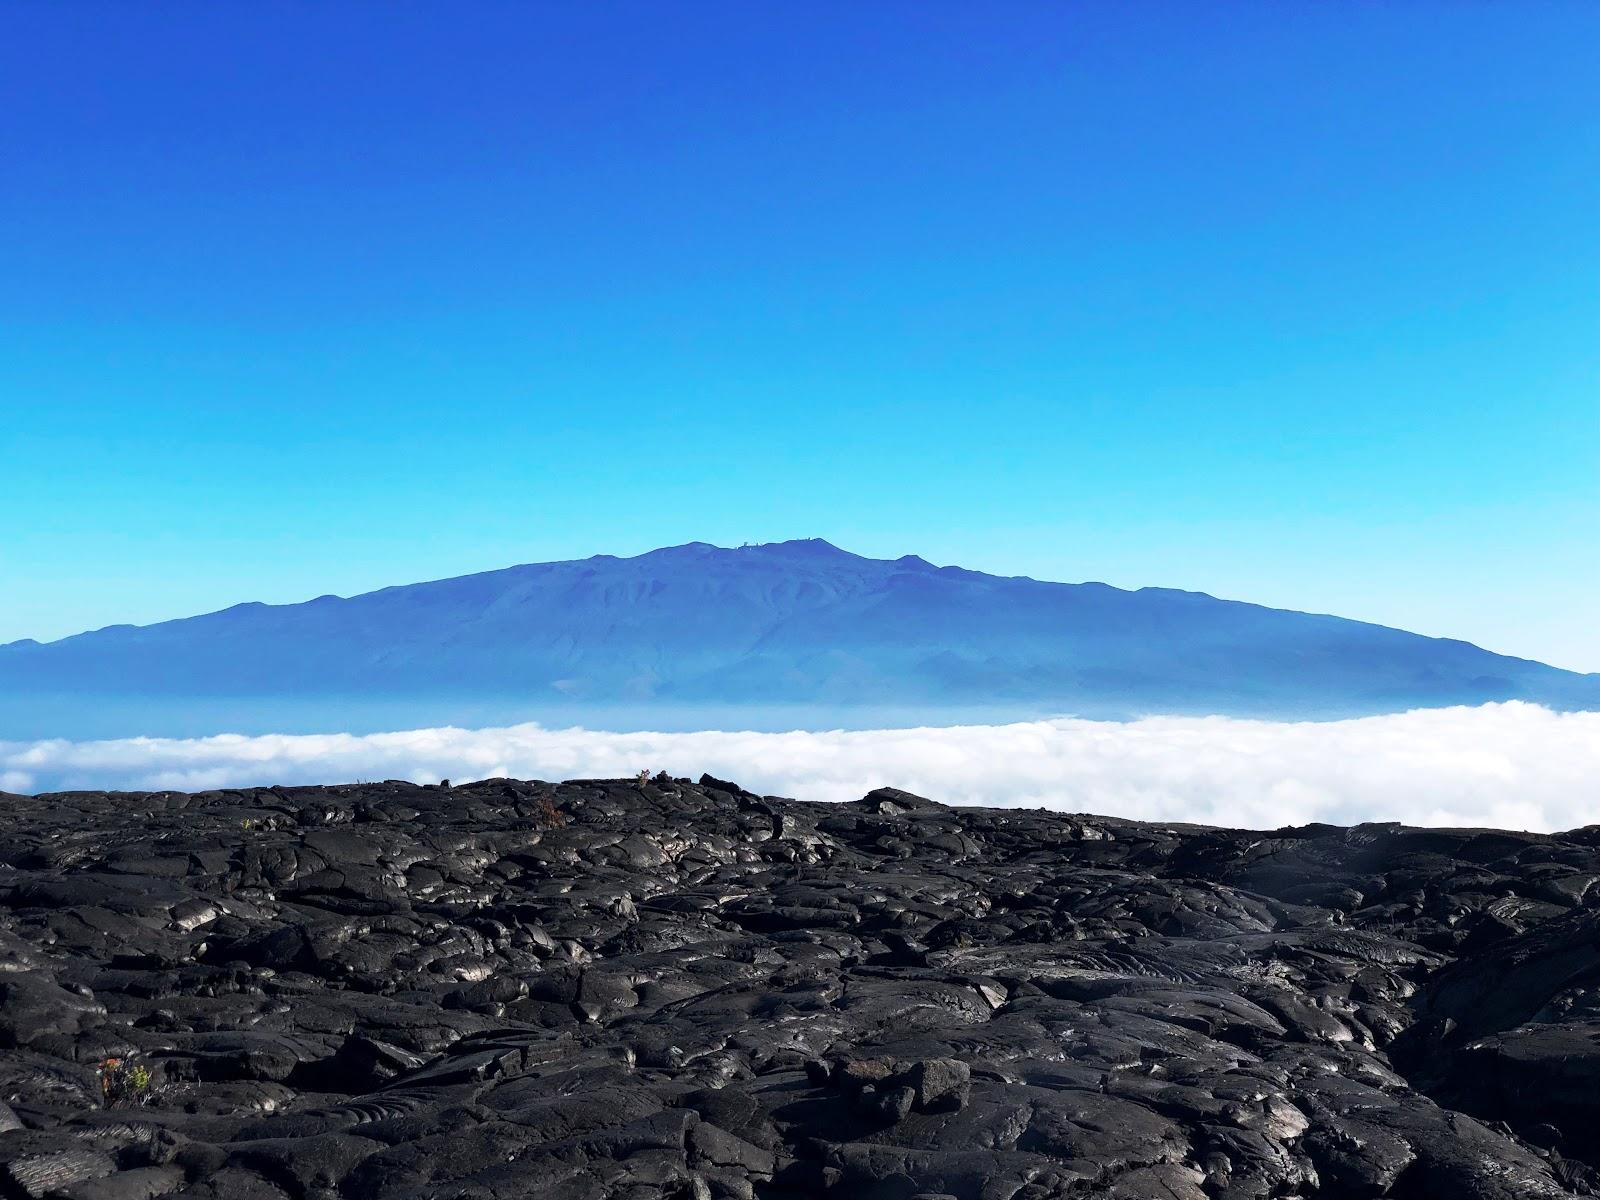 View across lava on Mauna Loa of Mauna Kea to the north.